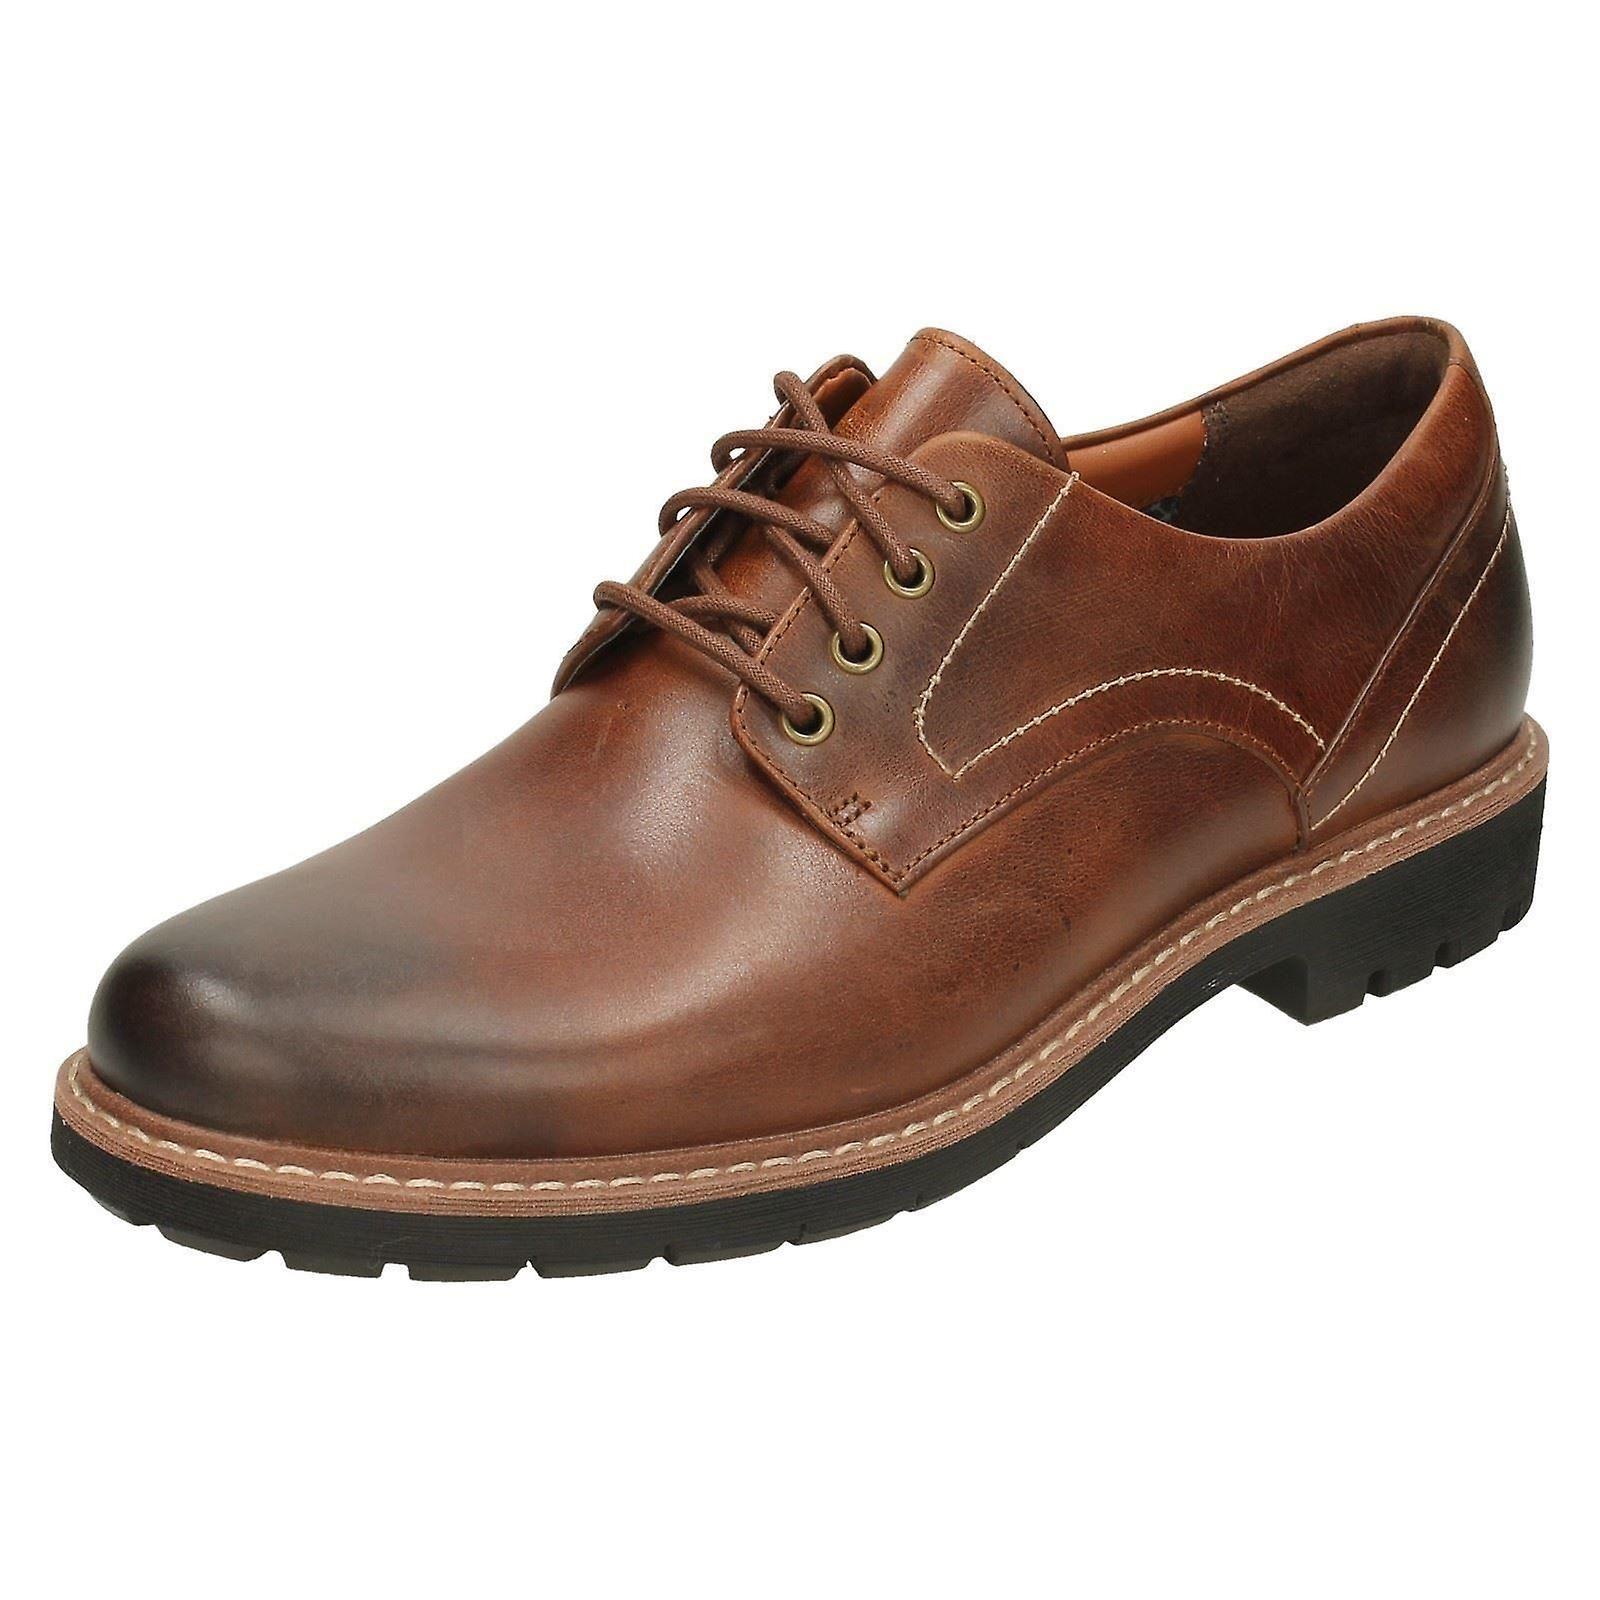 Herren Clarks Smart Lace Up Schuhe Batcombe Hall - dunklem Tan Leder - UK Größe 6G - EU Größe 39,5 - US Größe 7M